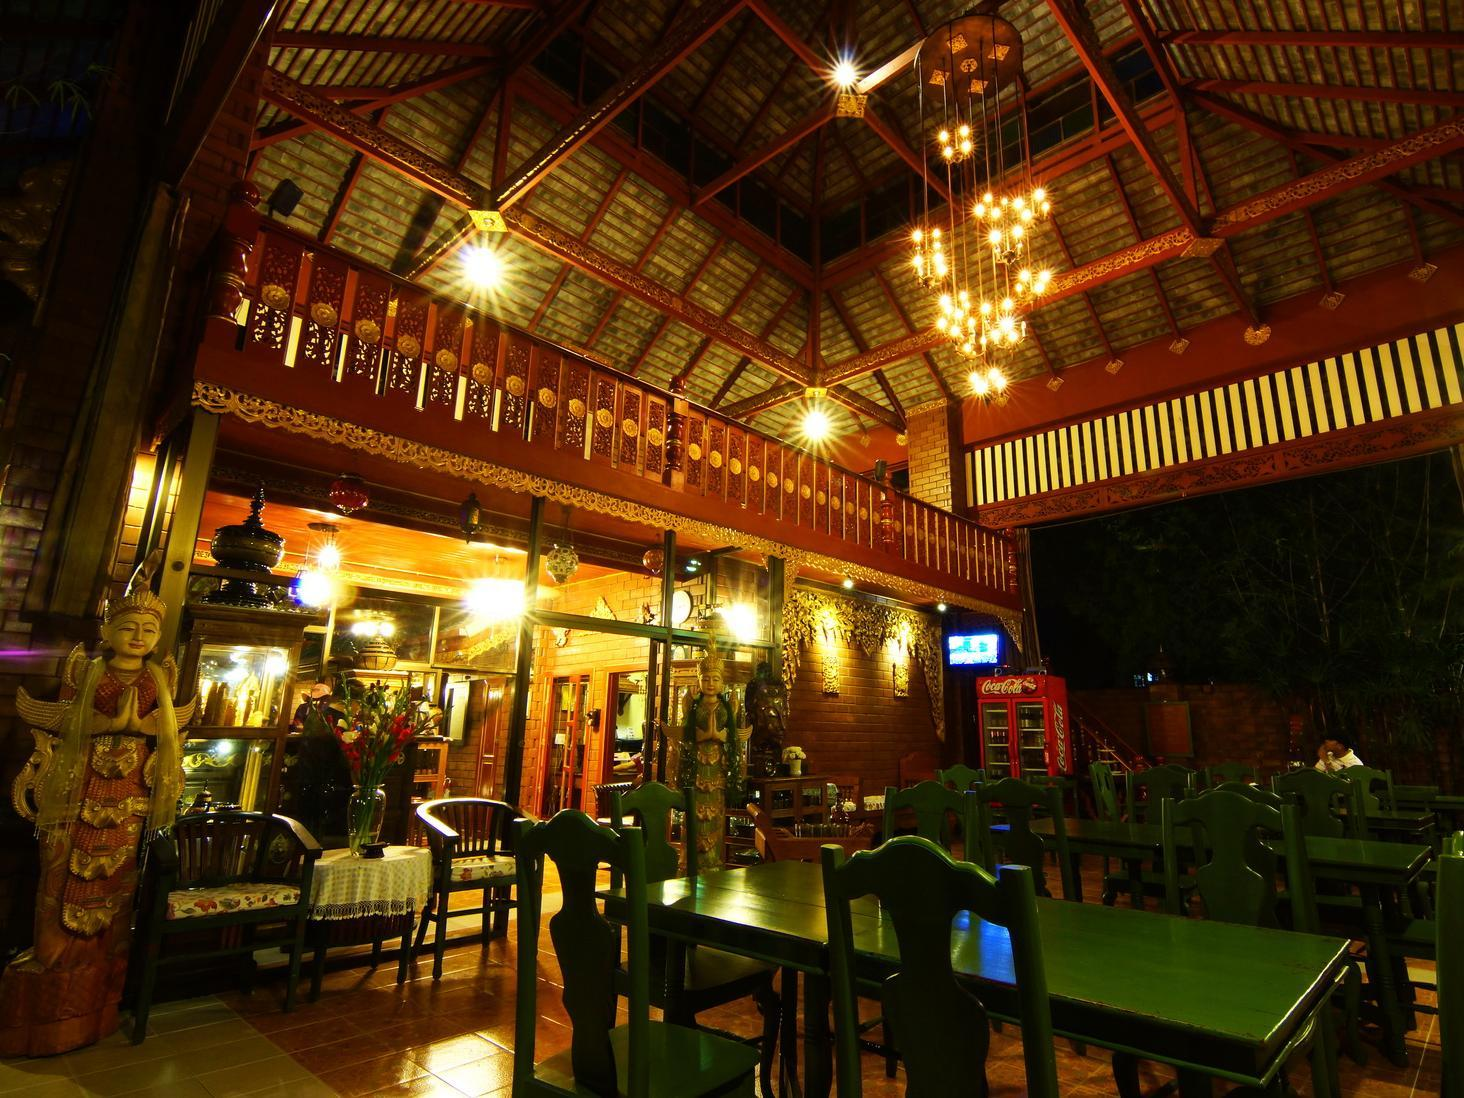 Irawadee Resort Tak - Hotel Exterior